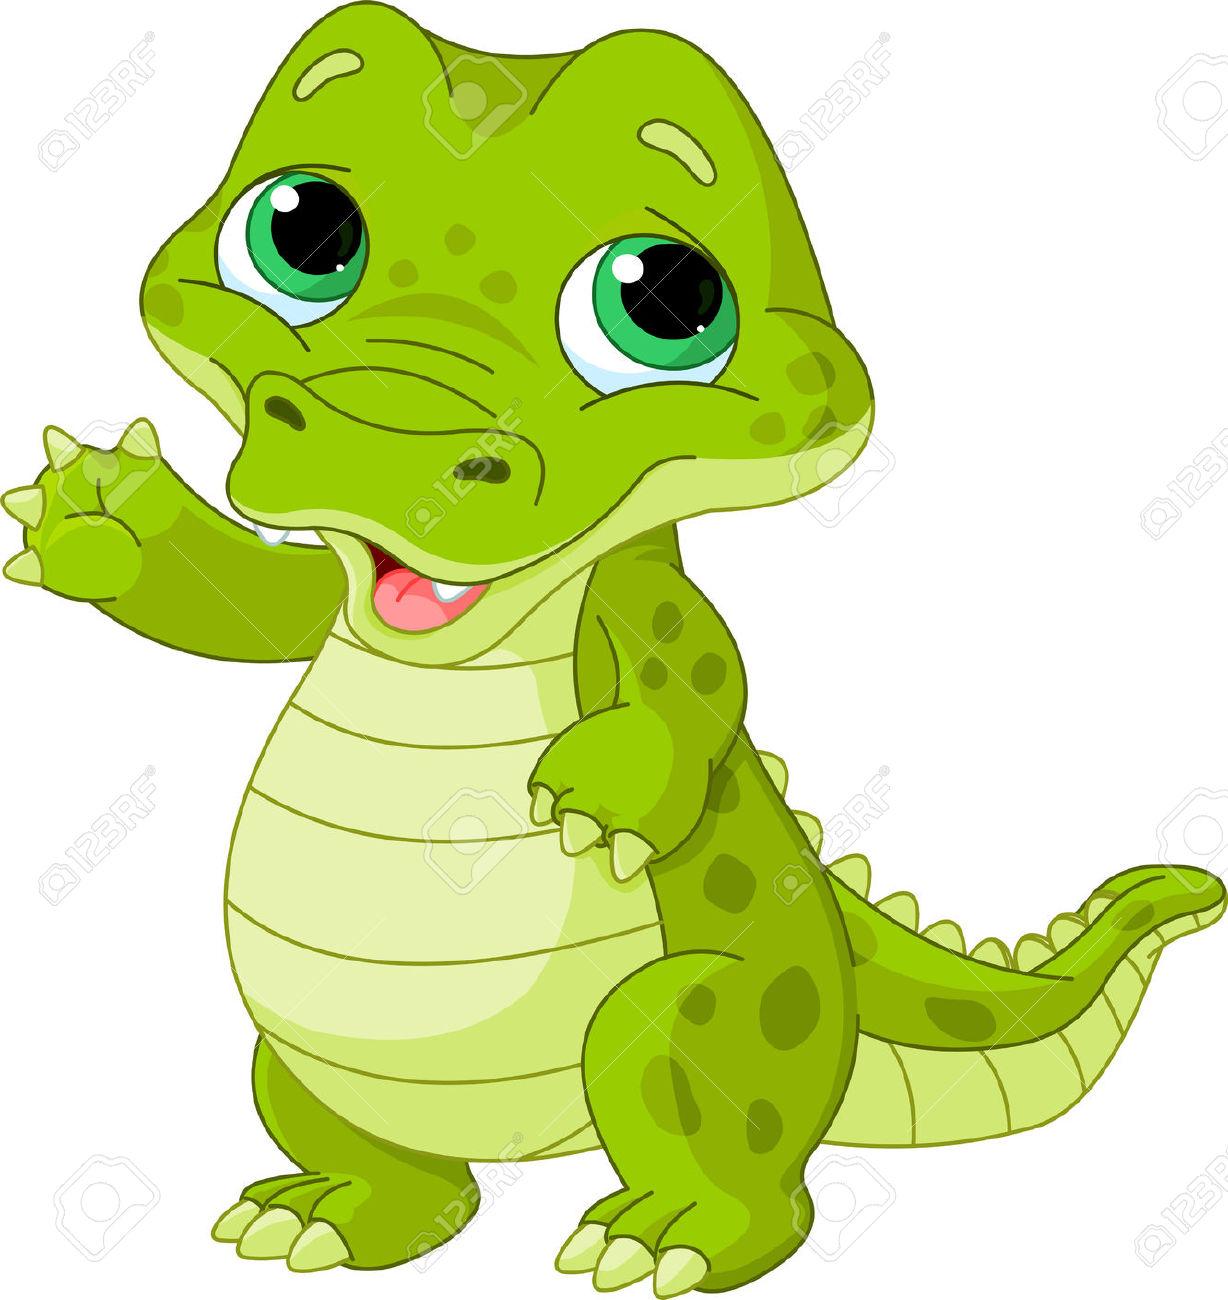 Sick clipart alligator Alligators http://previews  com/images/dazdraperma/dazdraperma1312 123rf